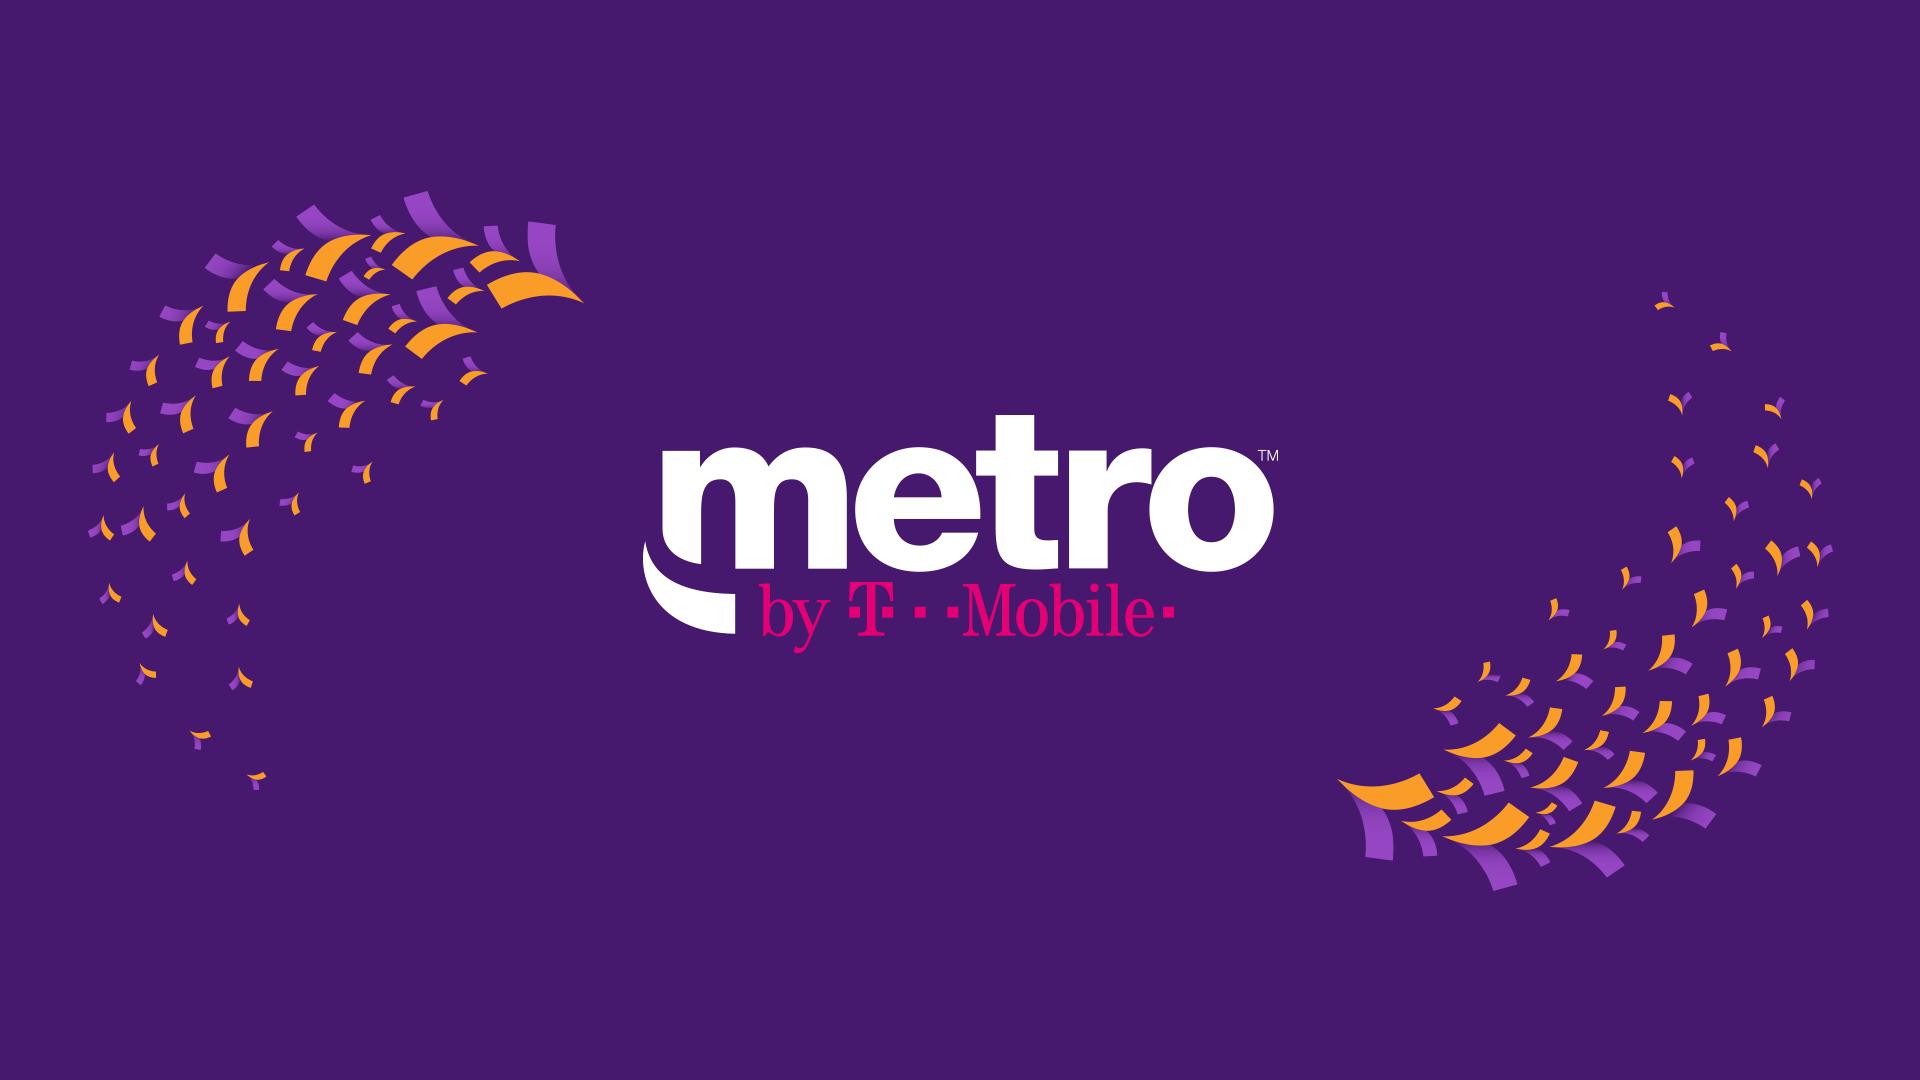 MetroPCS Springfield